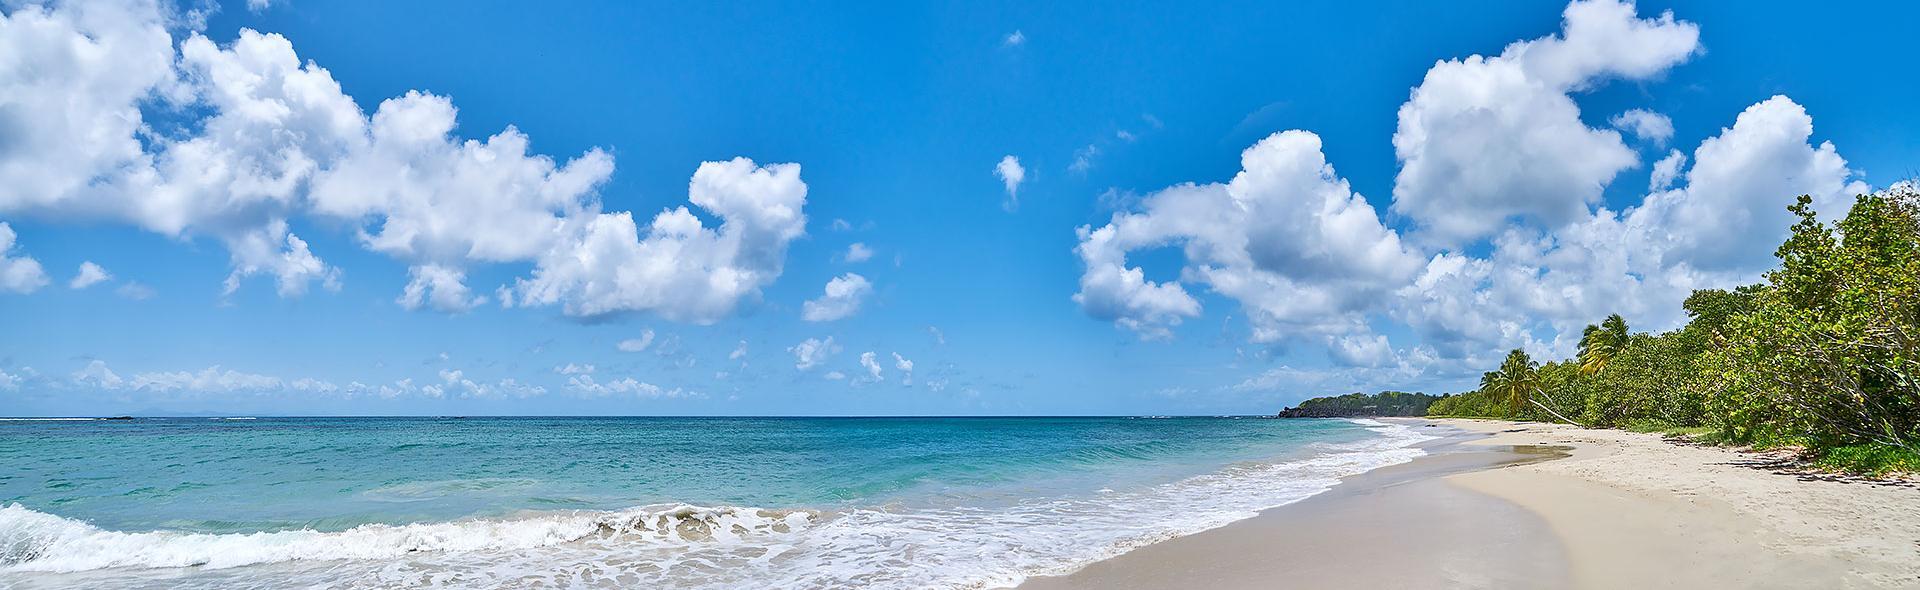 Sainte-Anne beach in Martinique